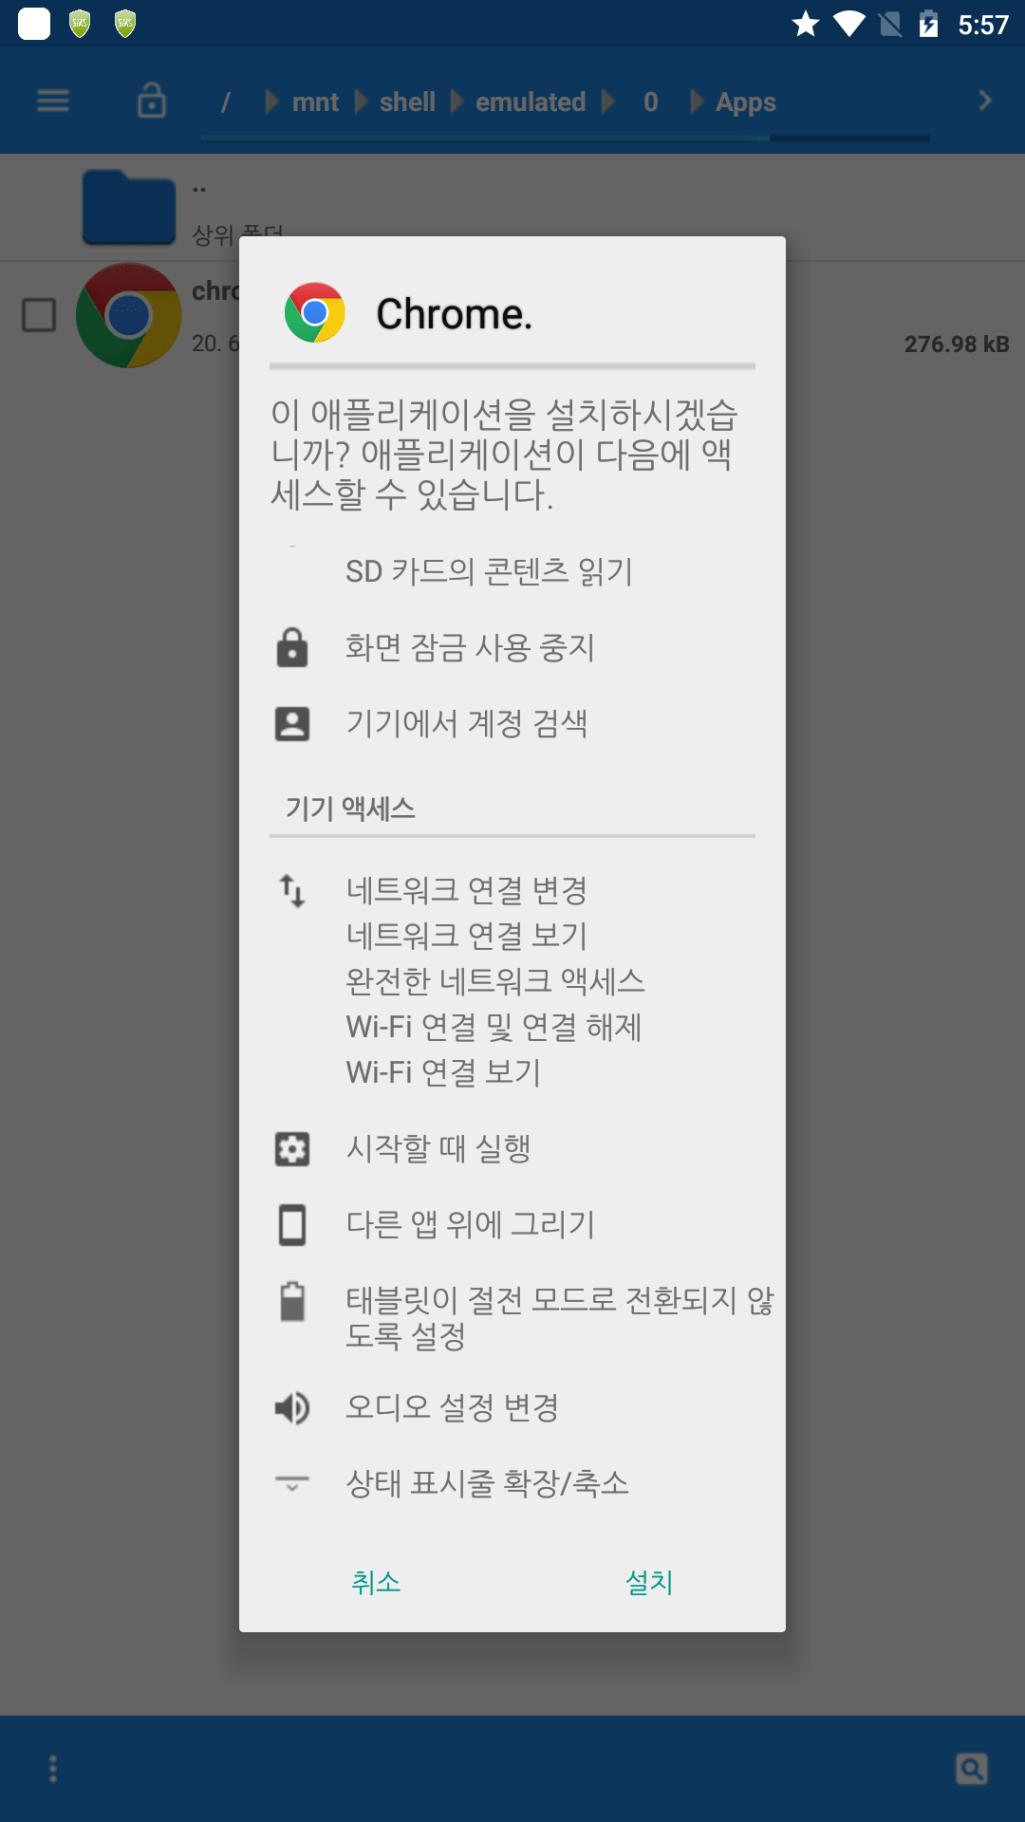 20200603 MoqHao 스미싱 악성앱